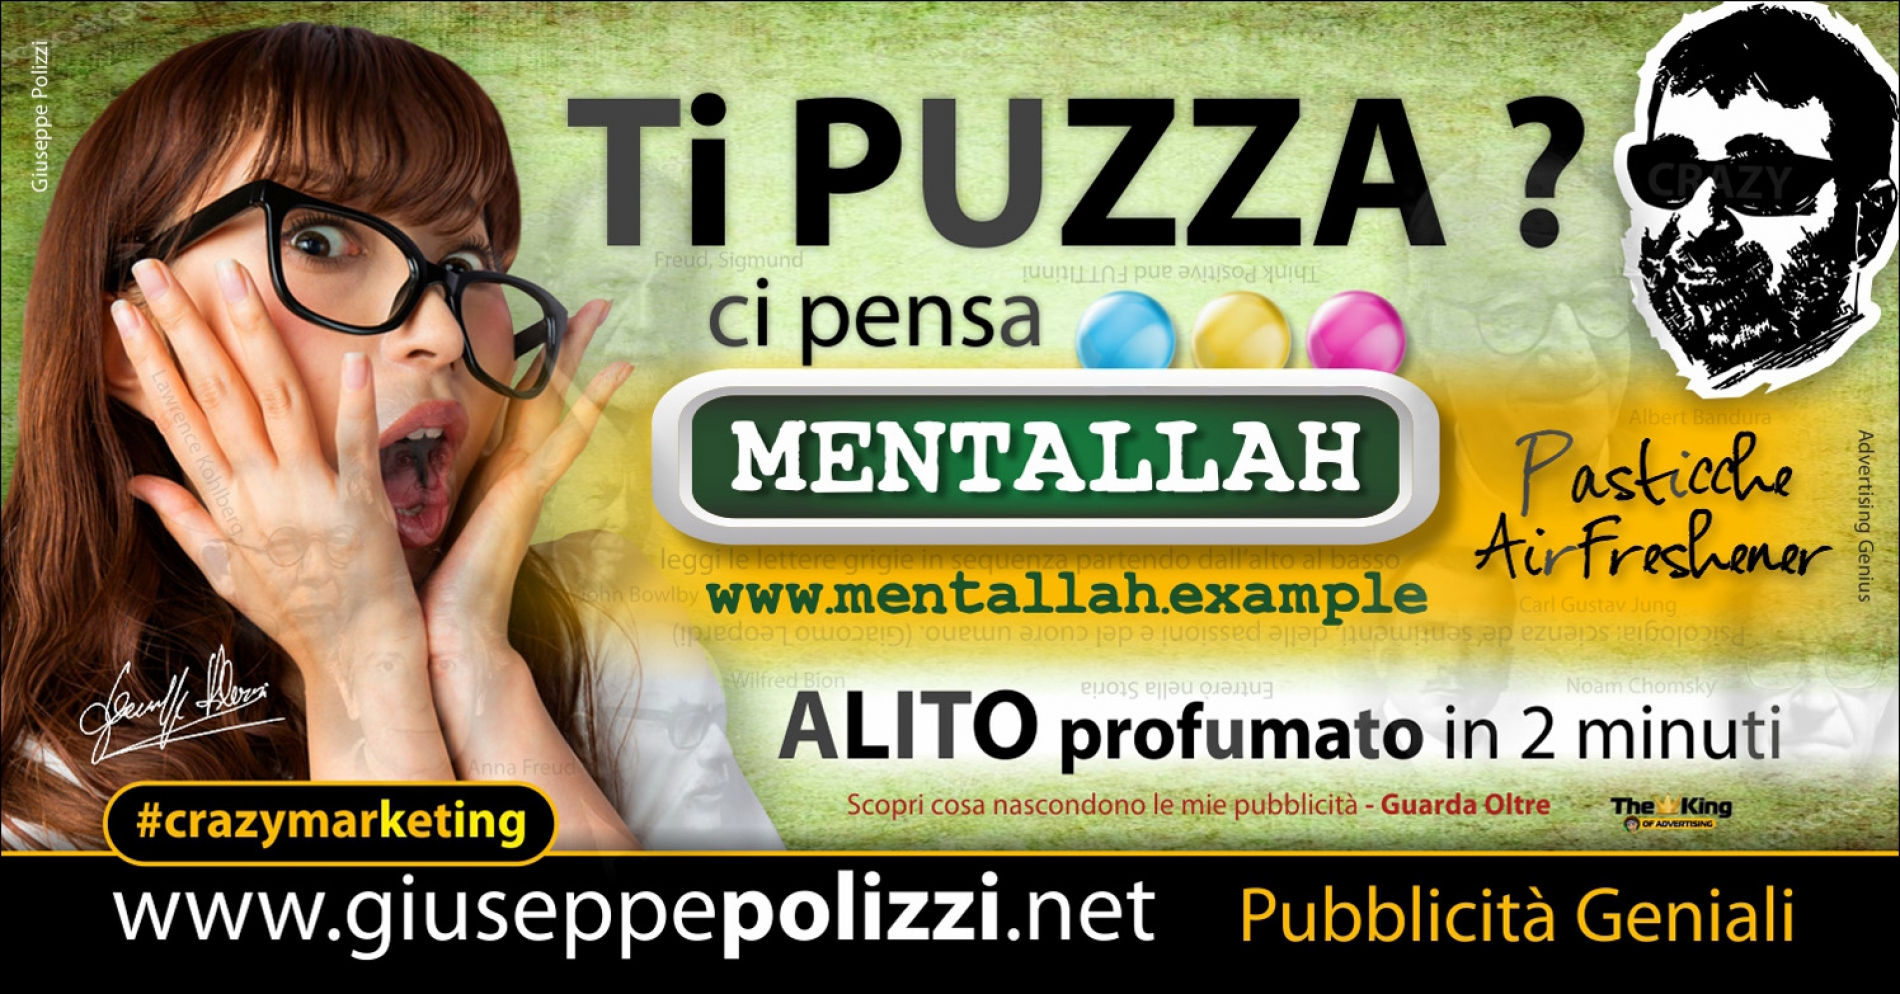 giuseppe Polizzi TI PUZZA crazymarketing genius